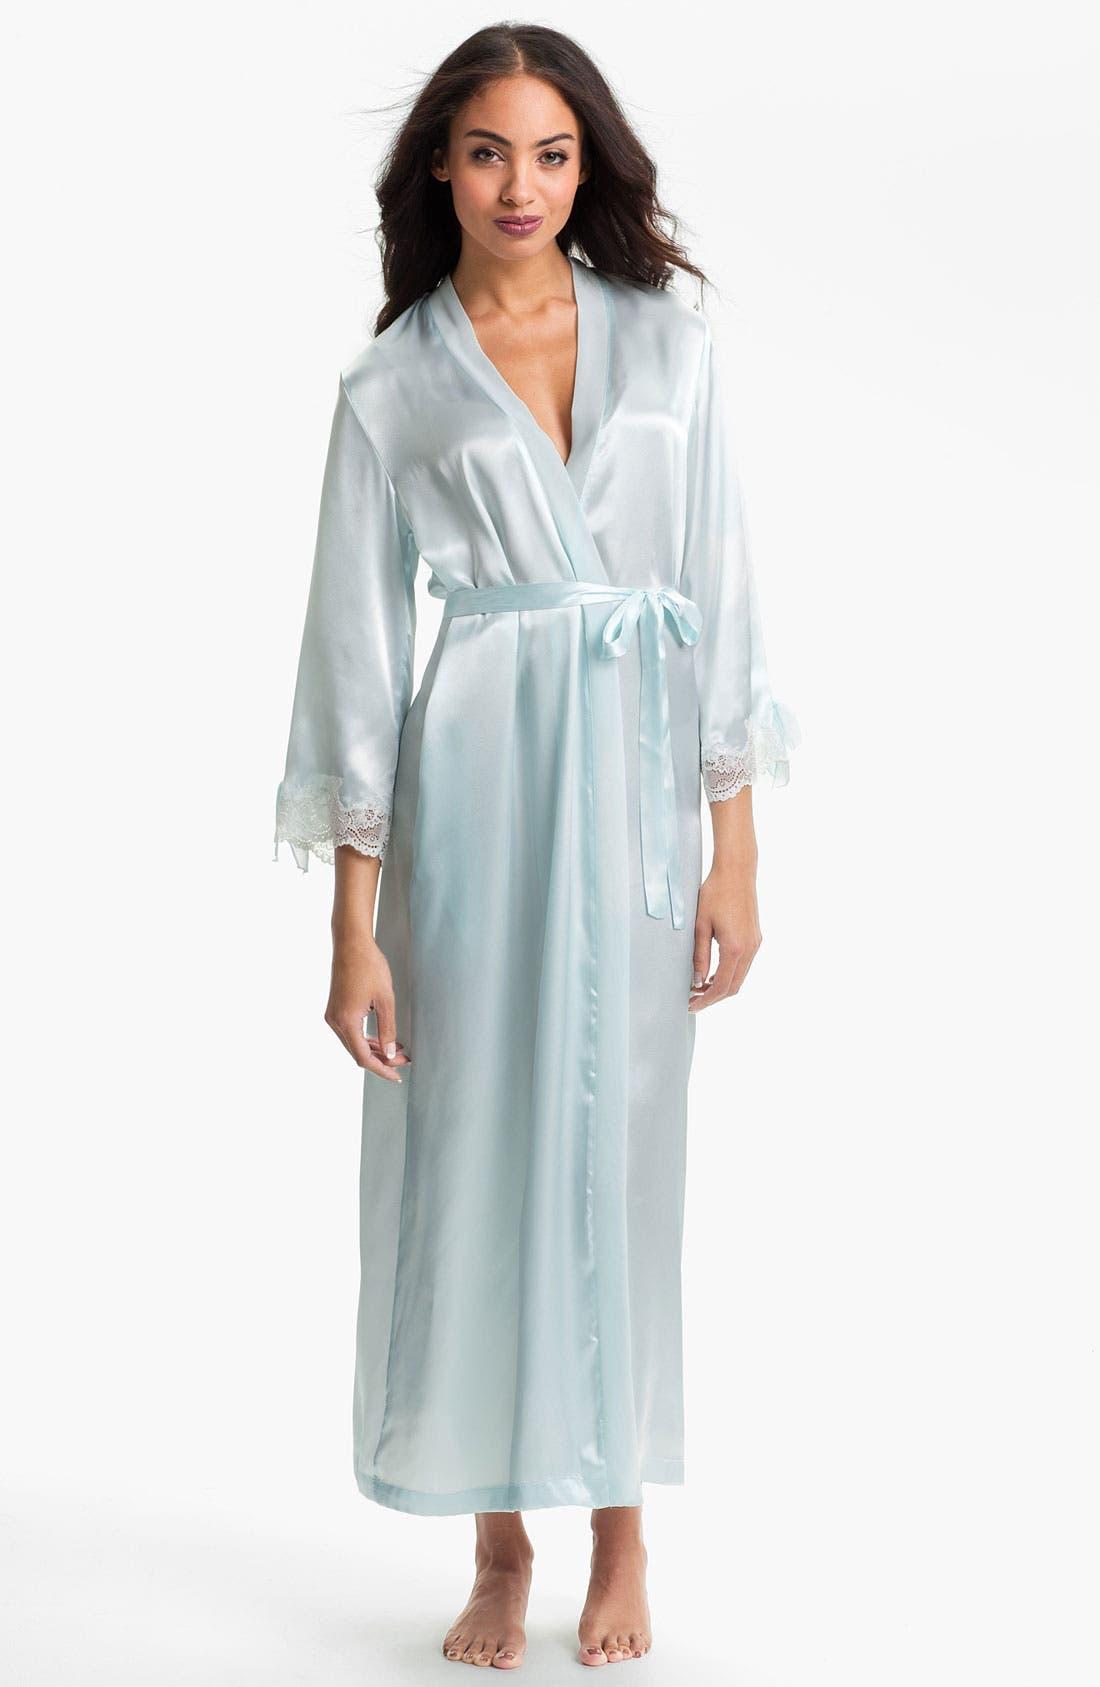 Main Image - Oscar de la Renta Sleepwear Lace Trim Charmeuse Robe